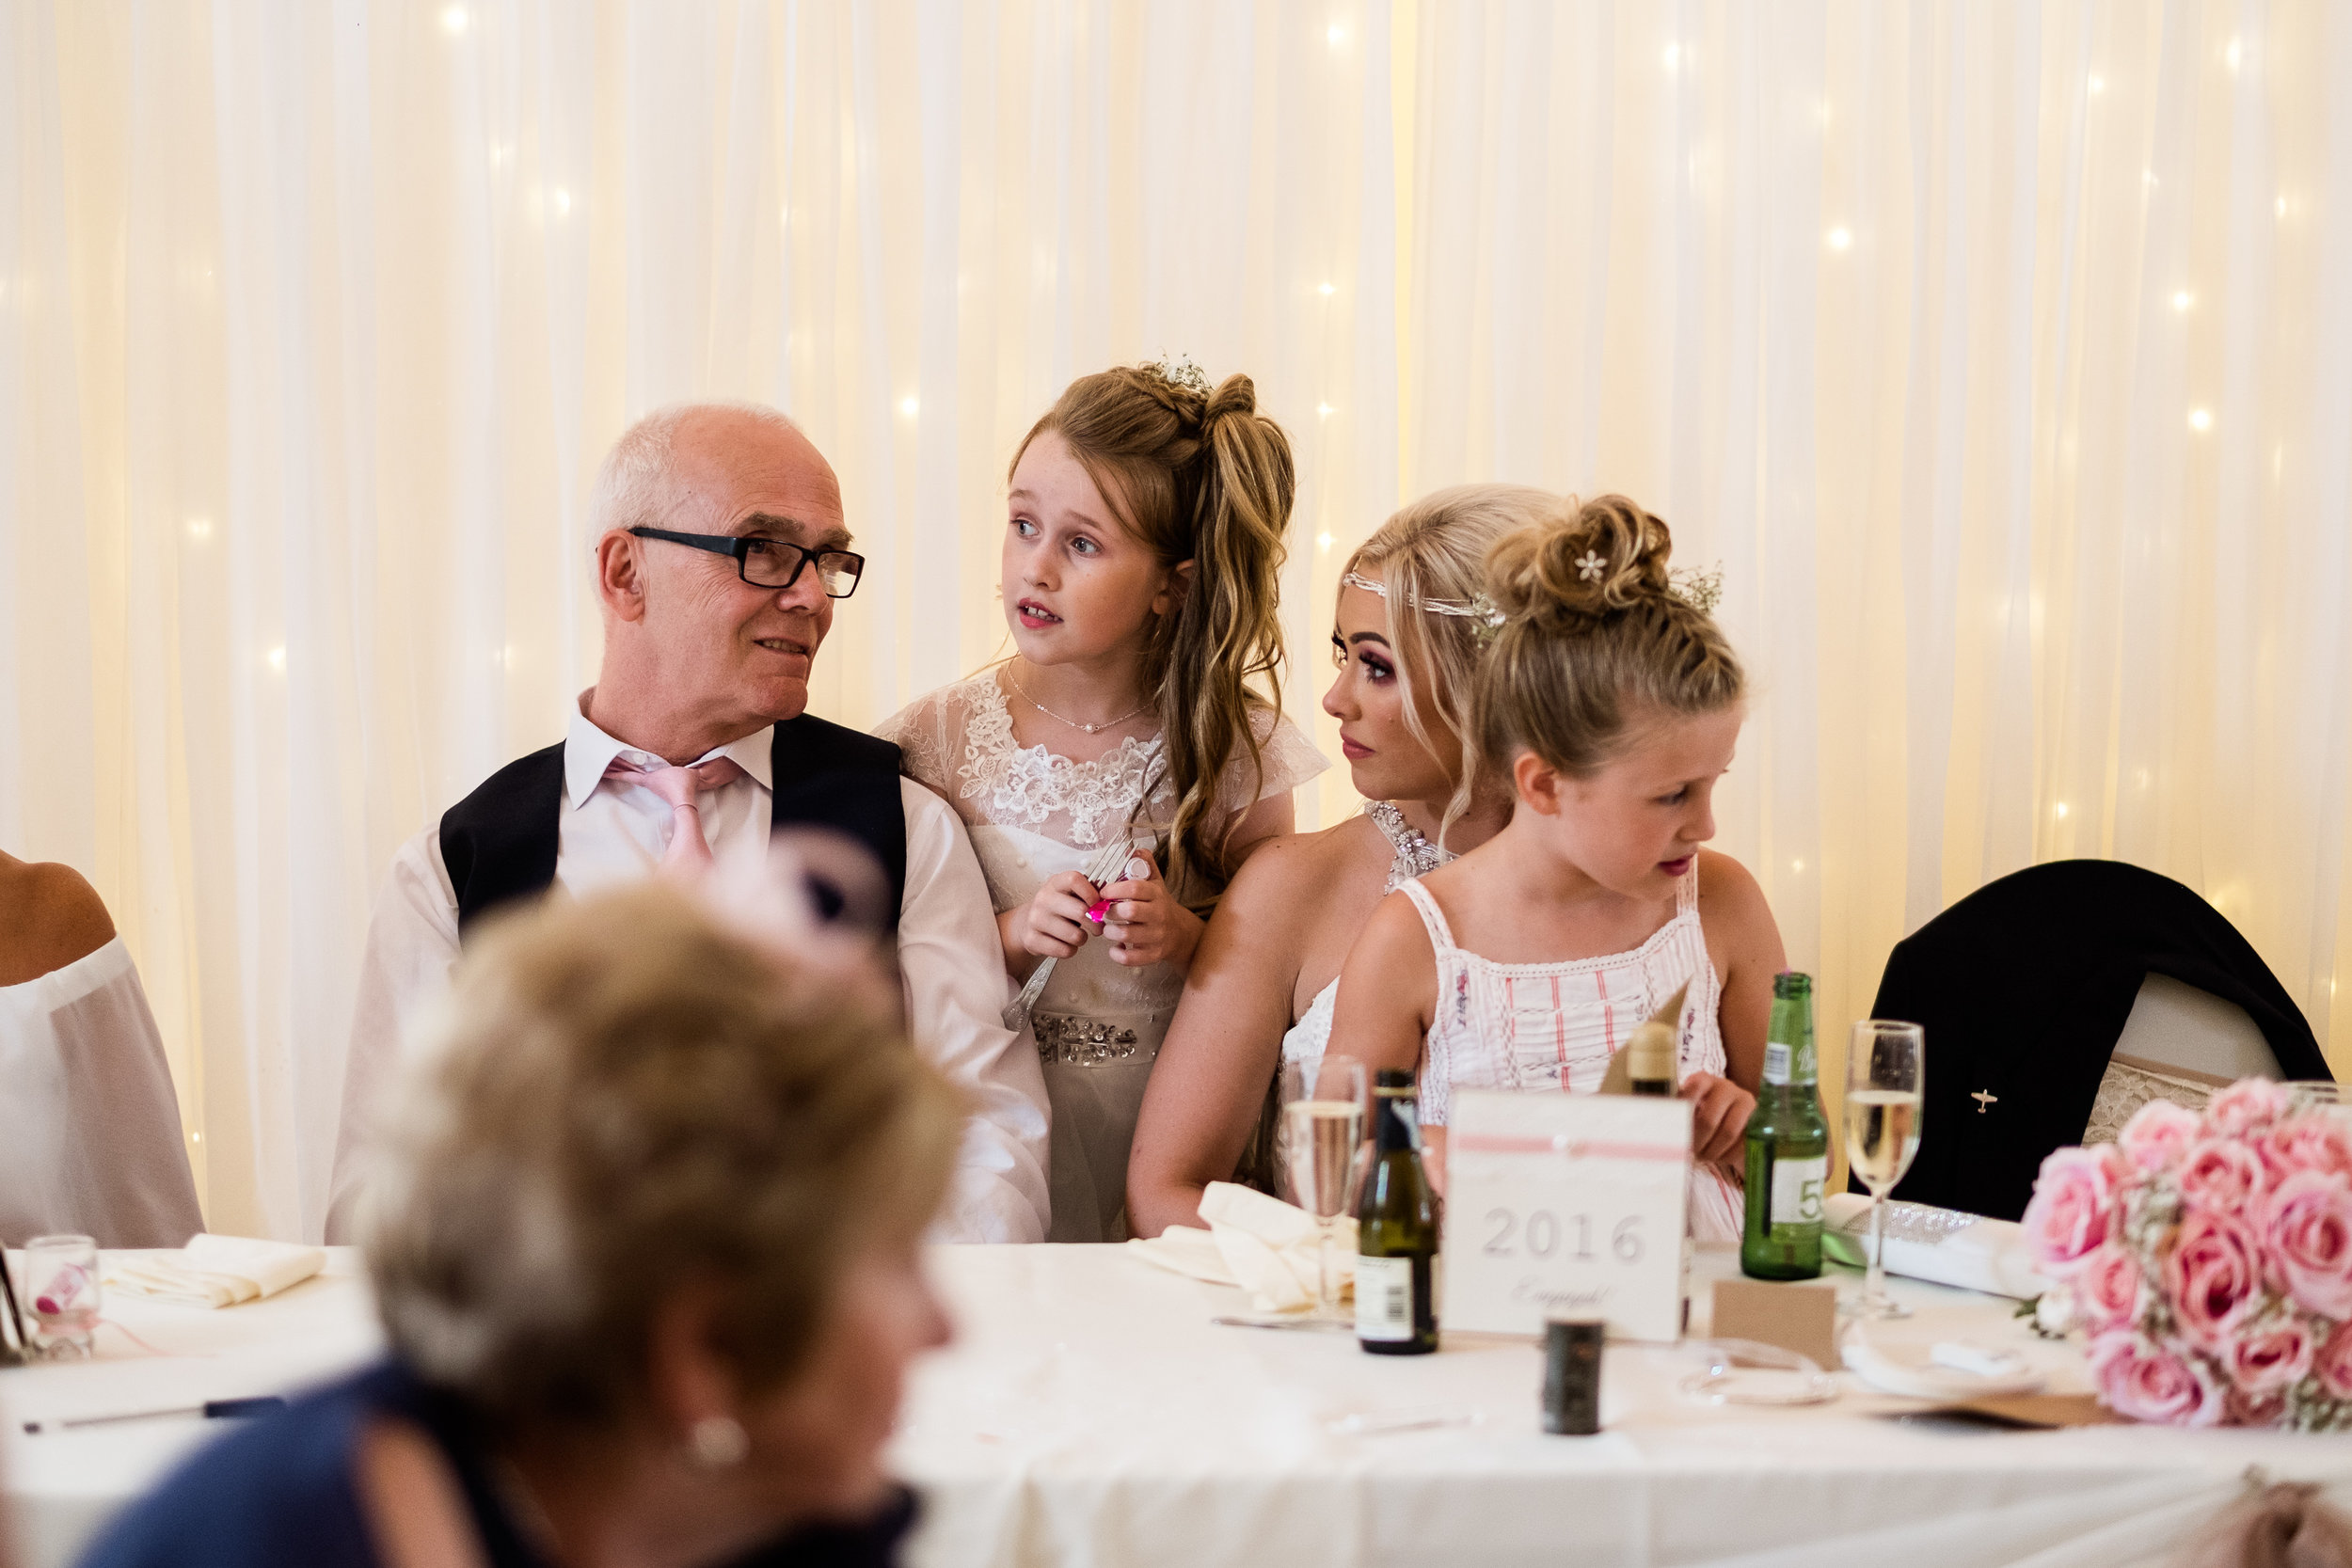 Summer Documentary Wedding Photography Floral Hall, Stoke-on-Trent, Staffordshire - Jenny Harper-40.jpg